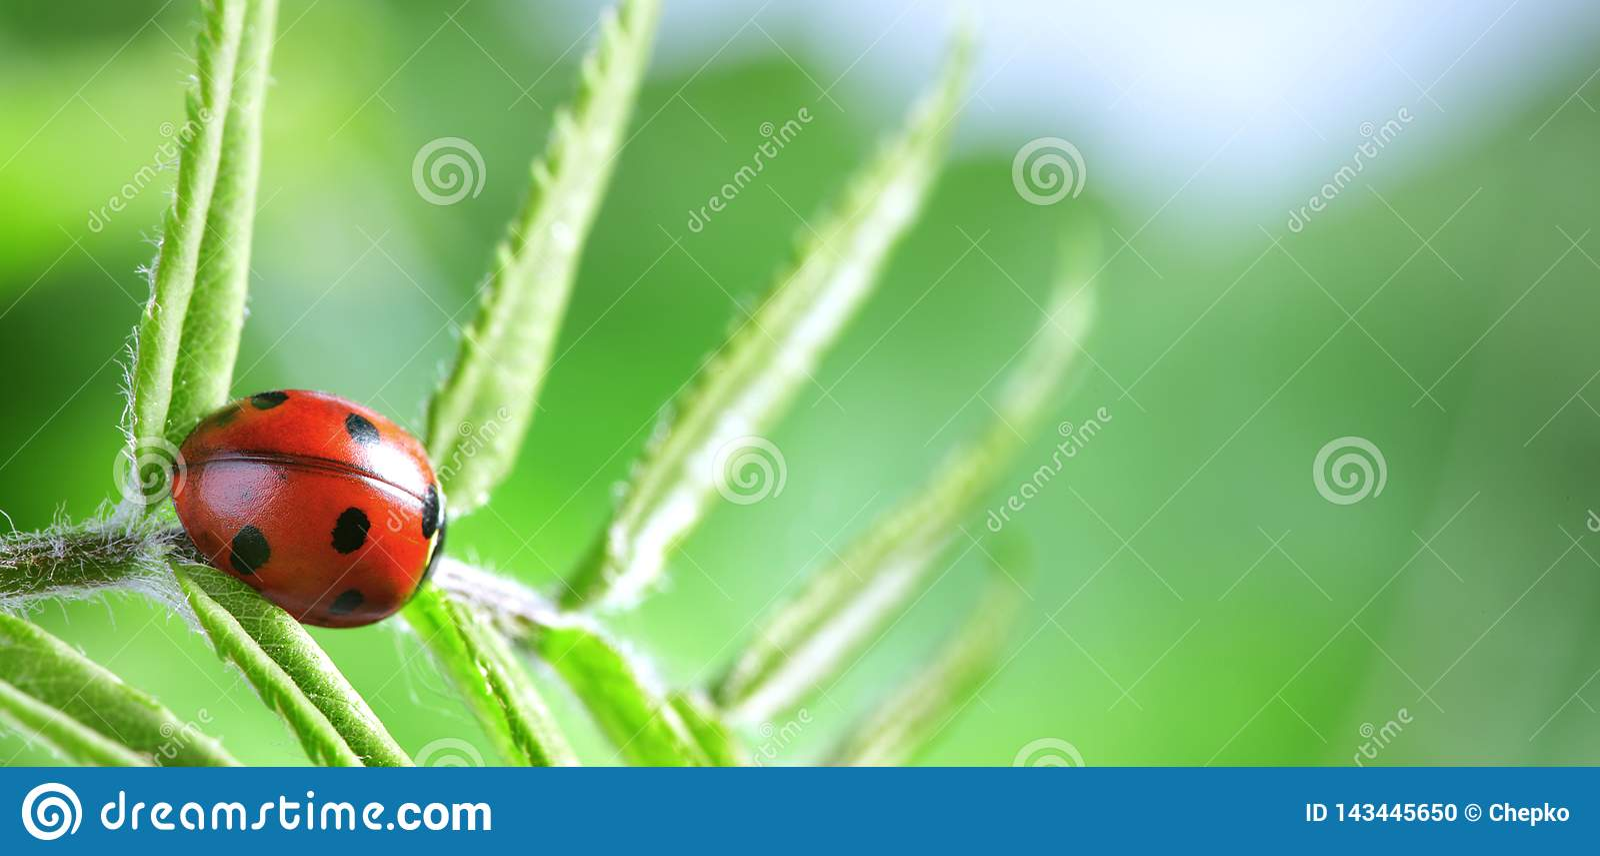 O joaninha vermelho na folha verde, joaninha rasteja na haste da planta na mola no verão do jardim